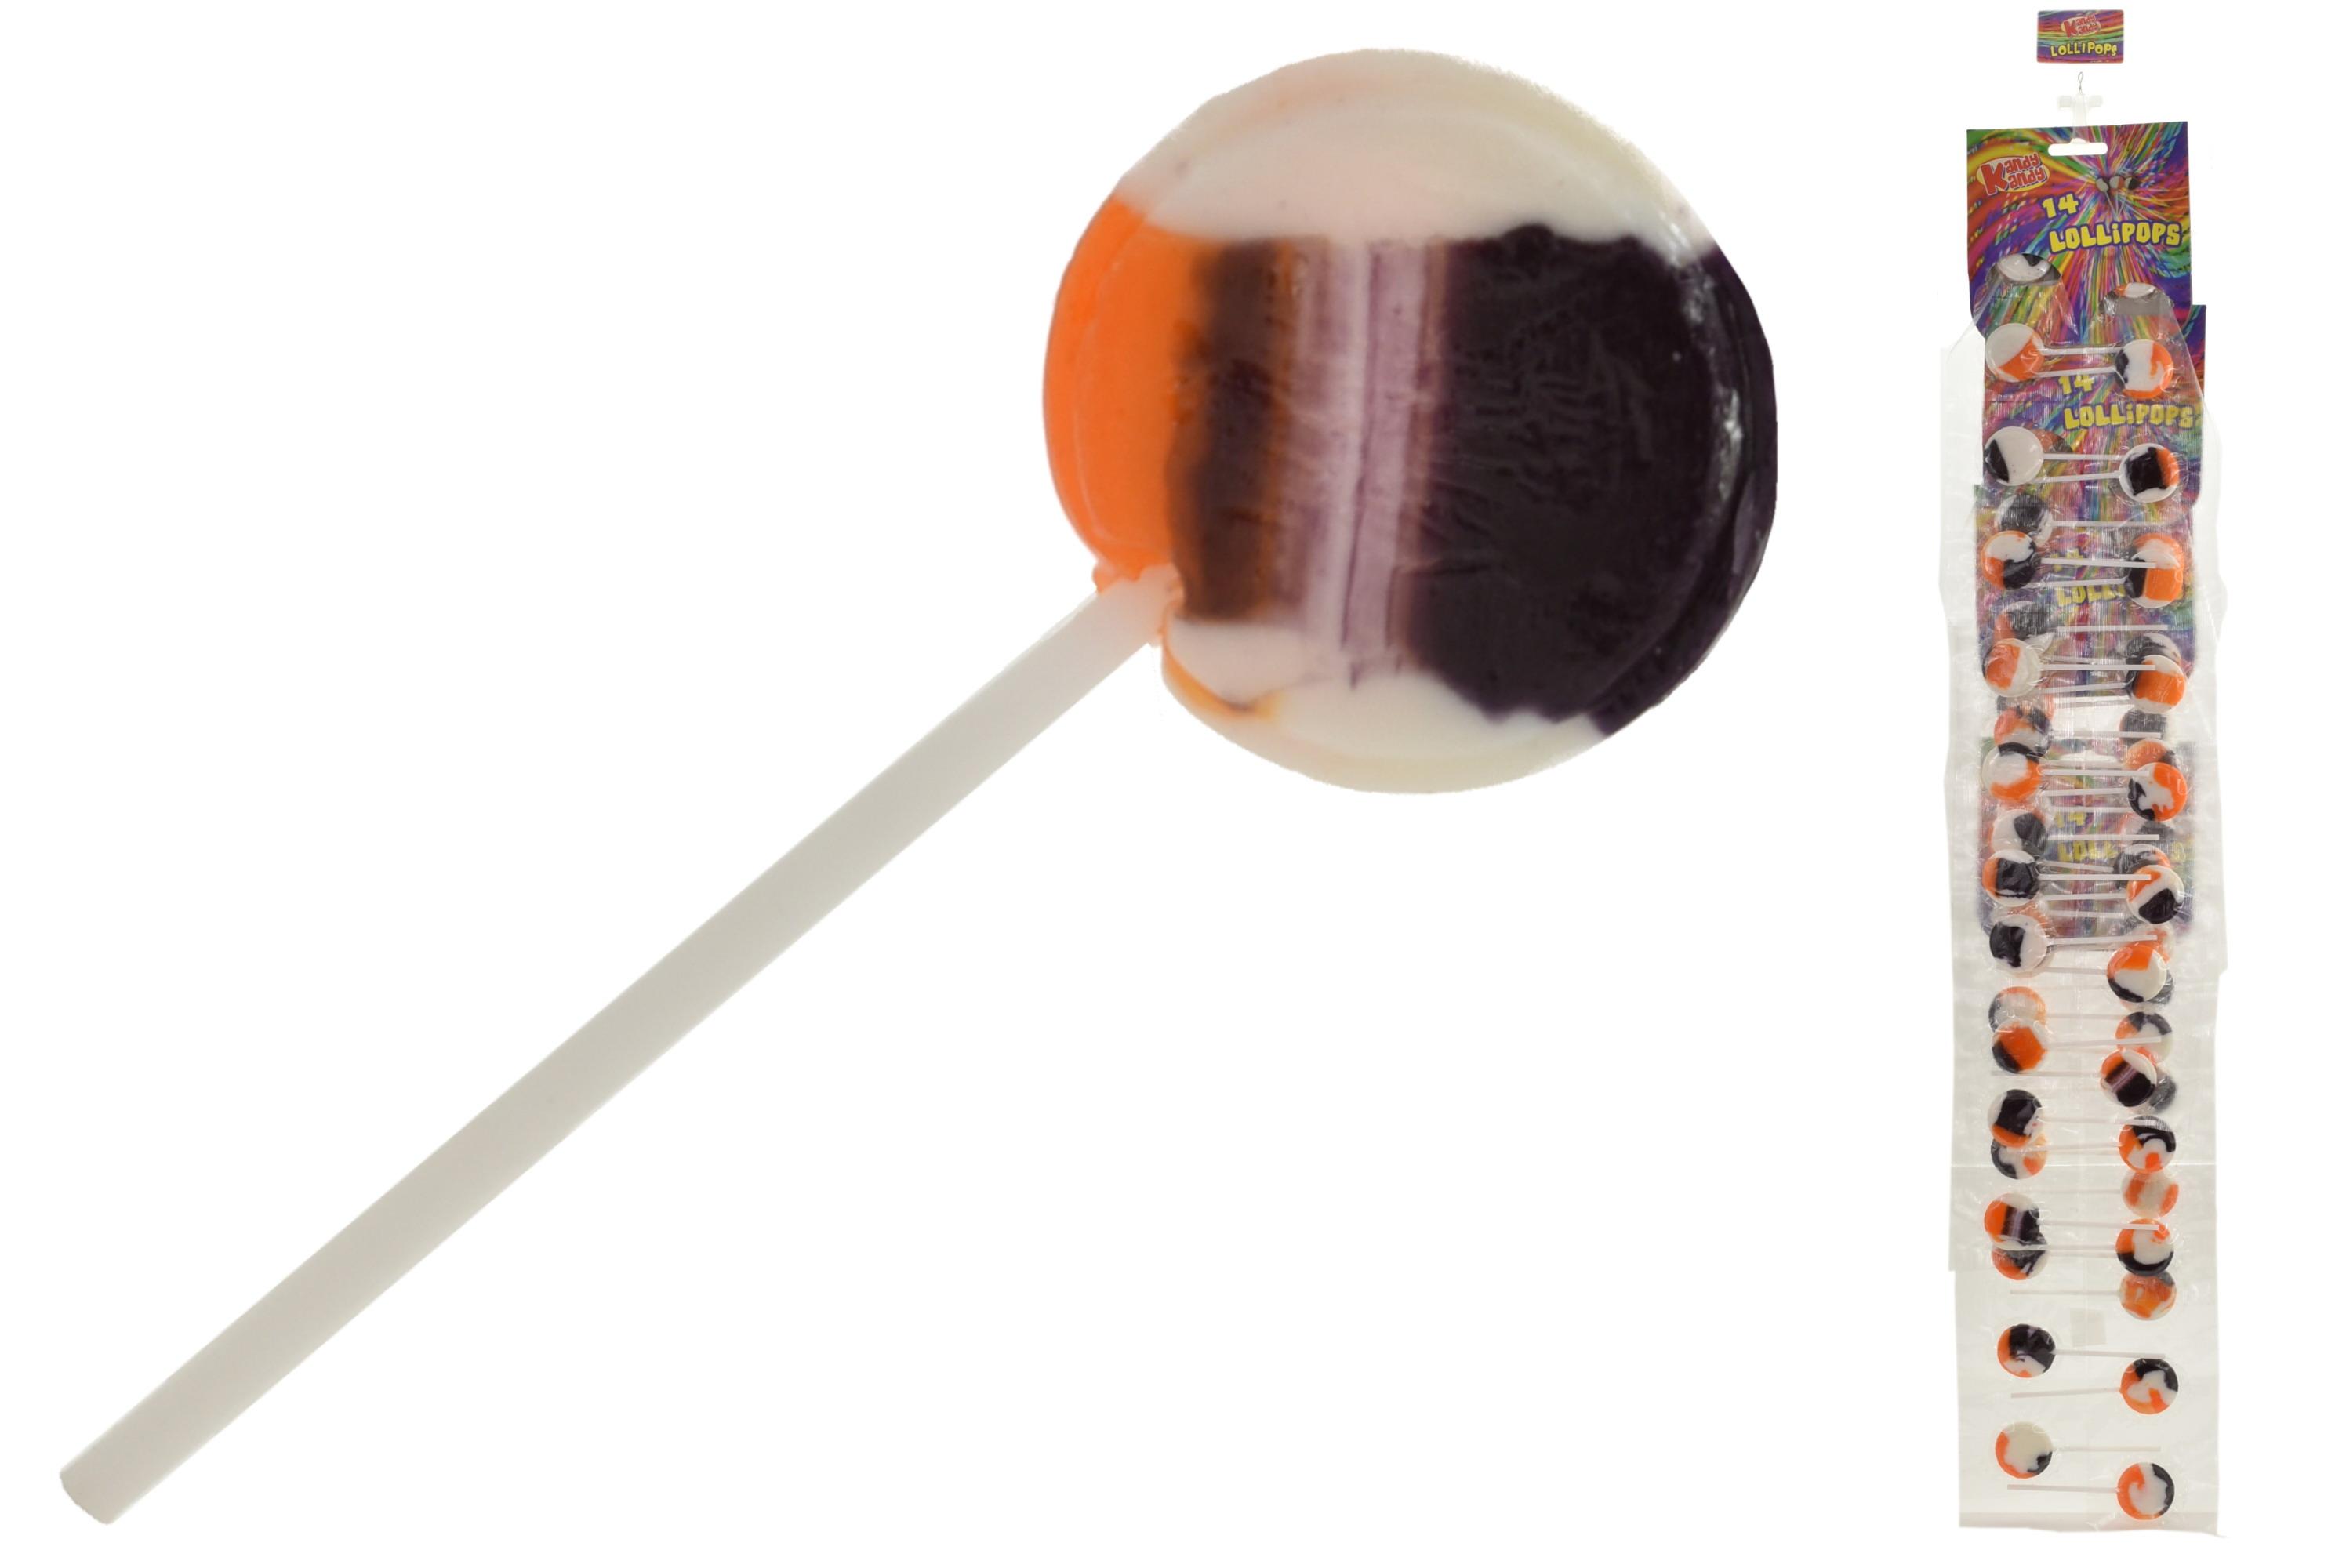 14 Round Peppermint & Malt Lollipops On Strip